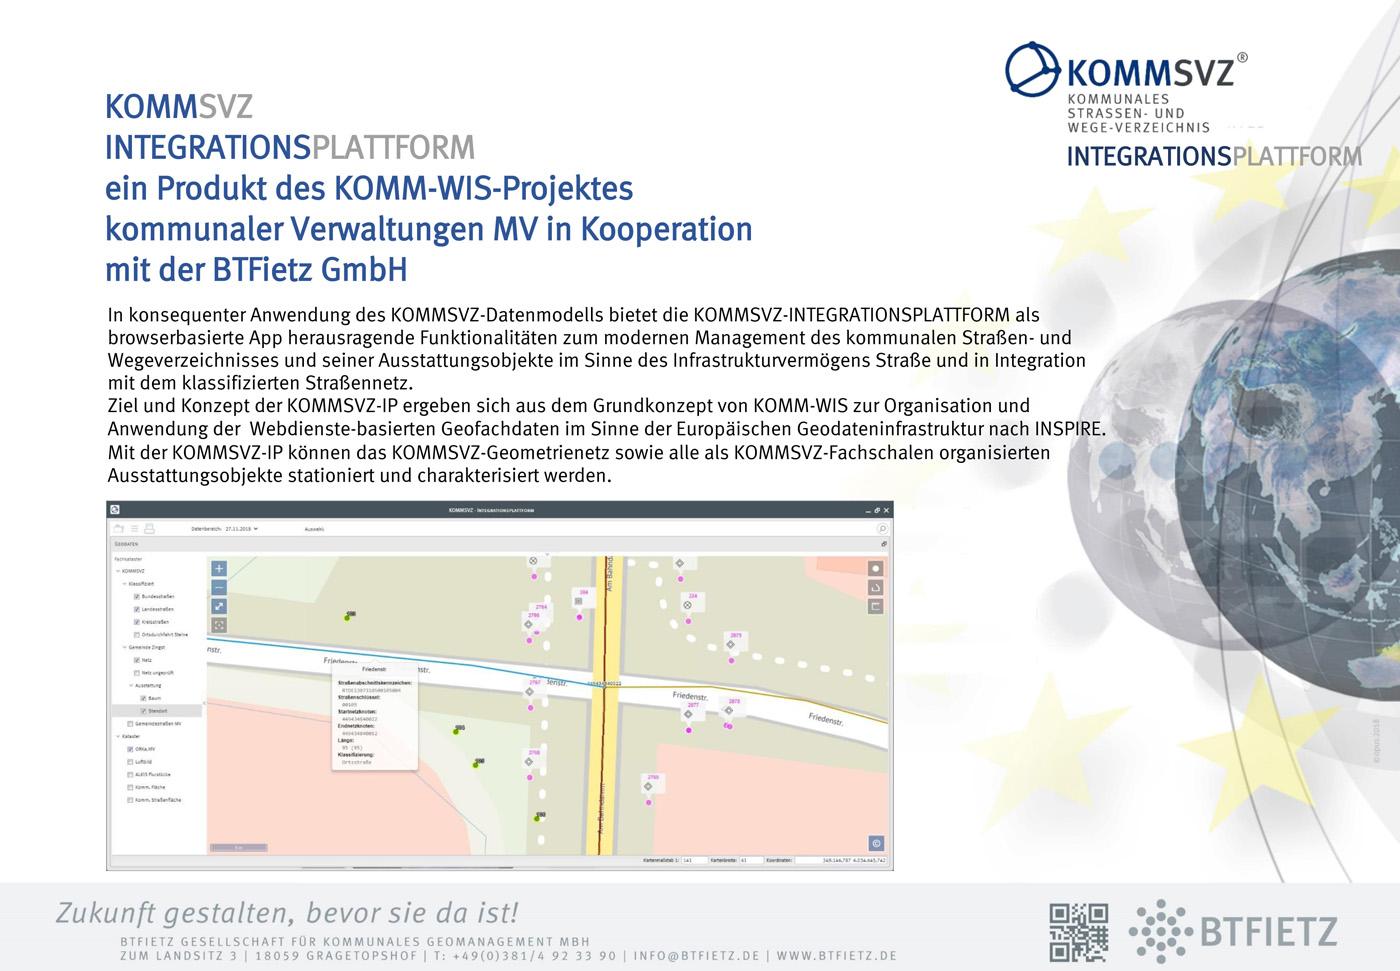 KOMMSVZ-IP.jpg